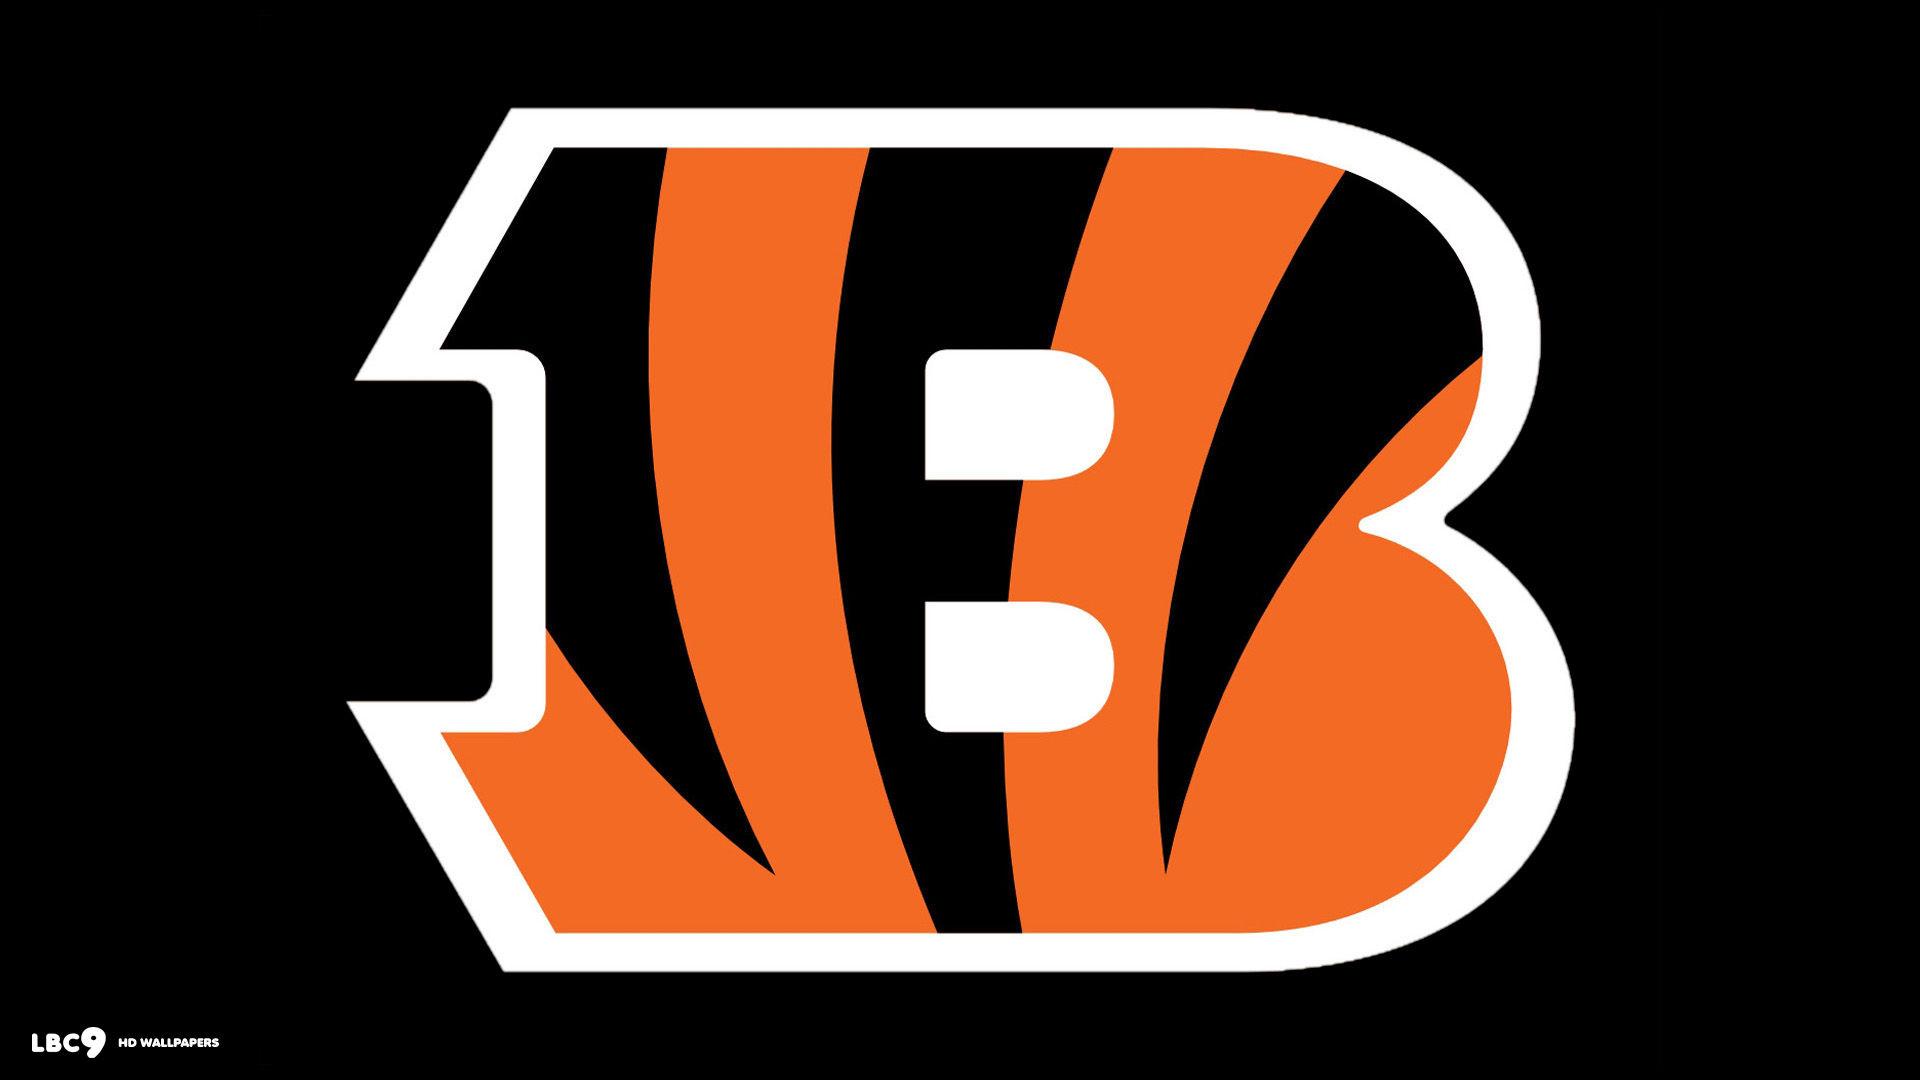 [NFL] Preview 2015: Cincinnati Bengals